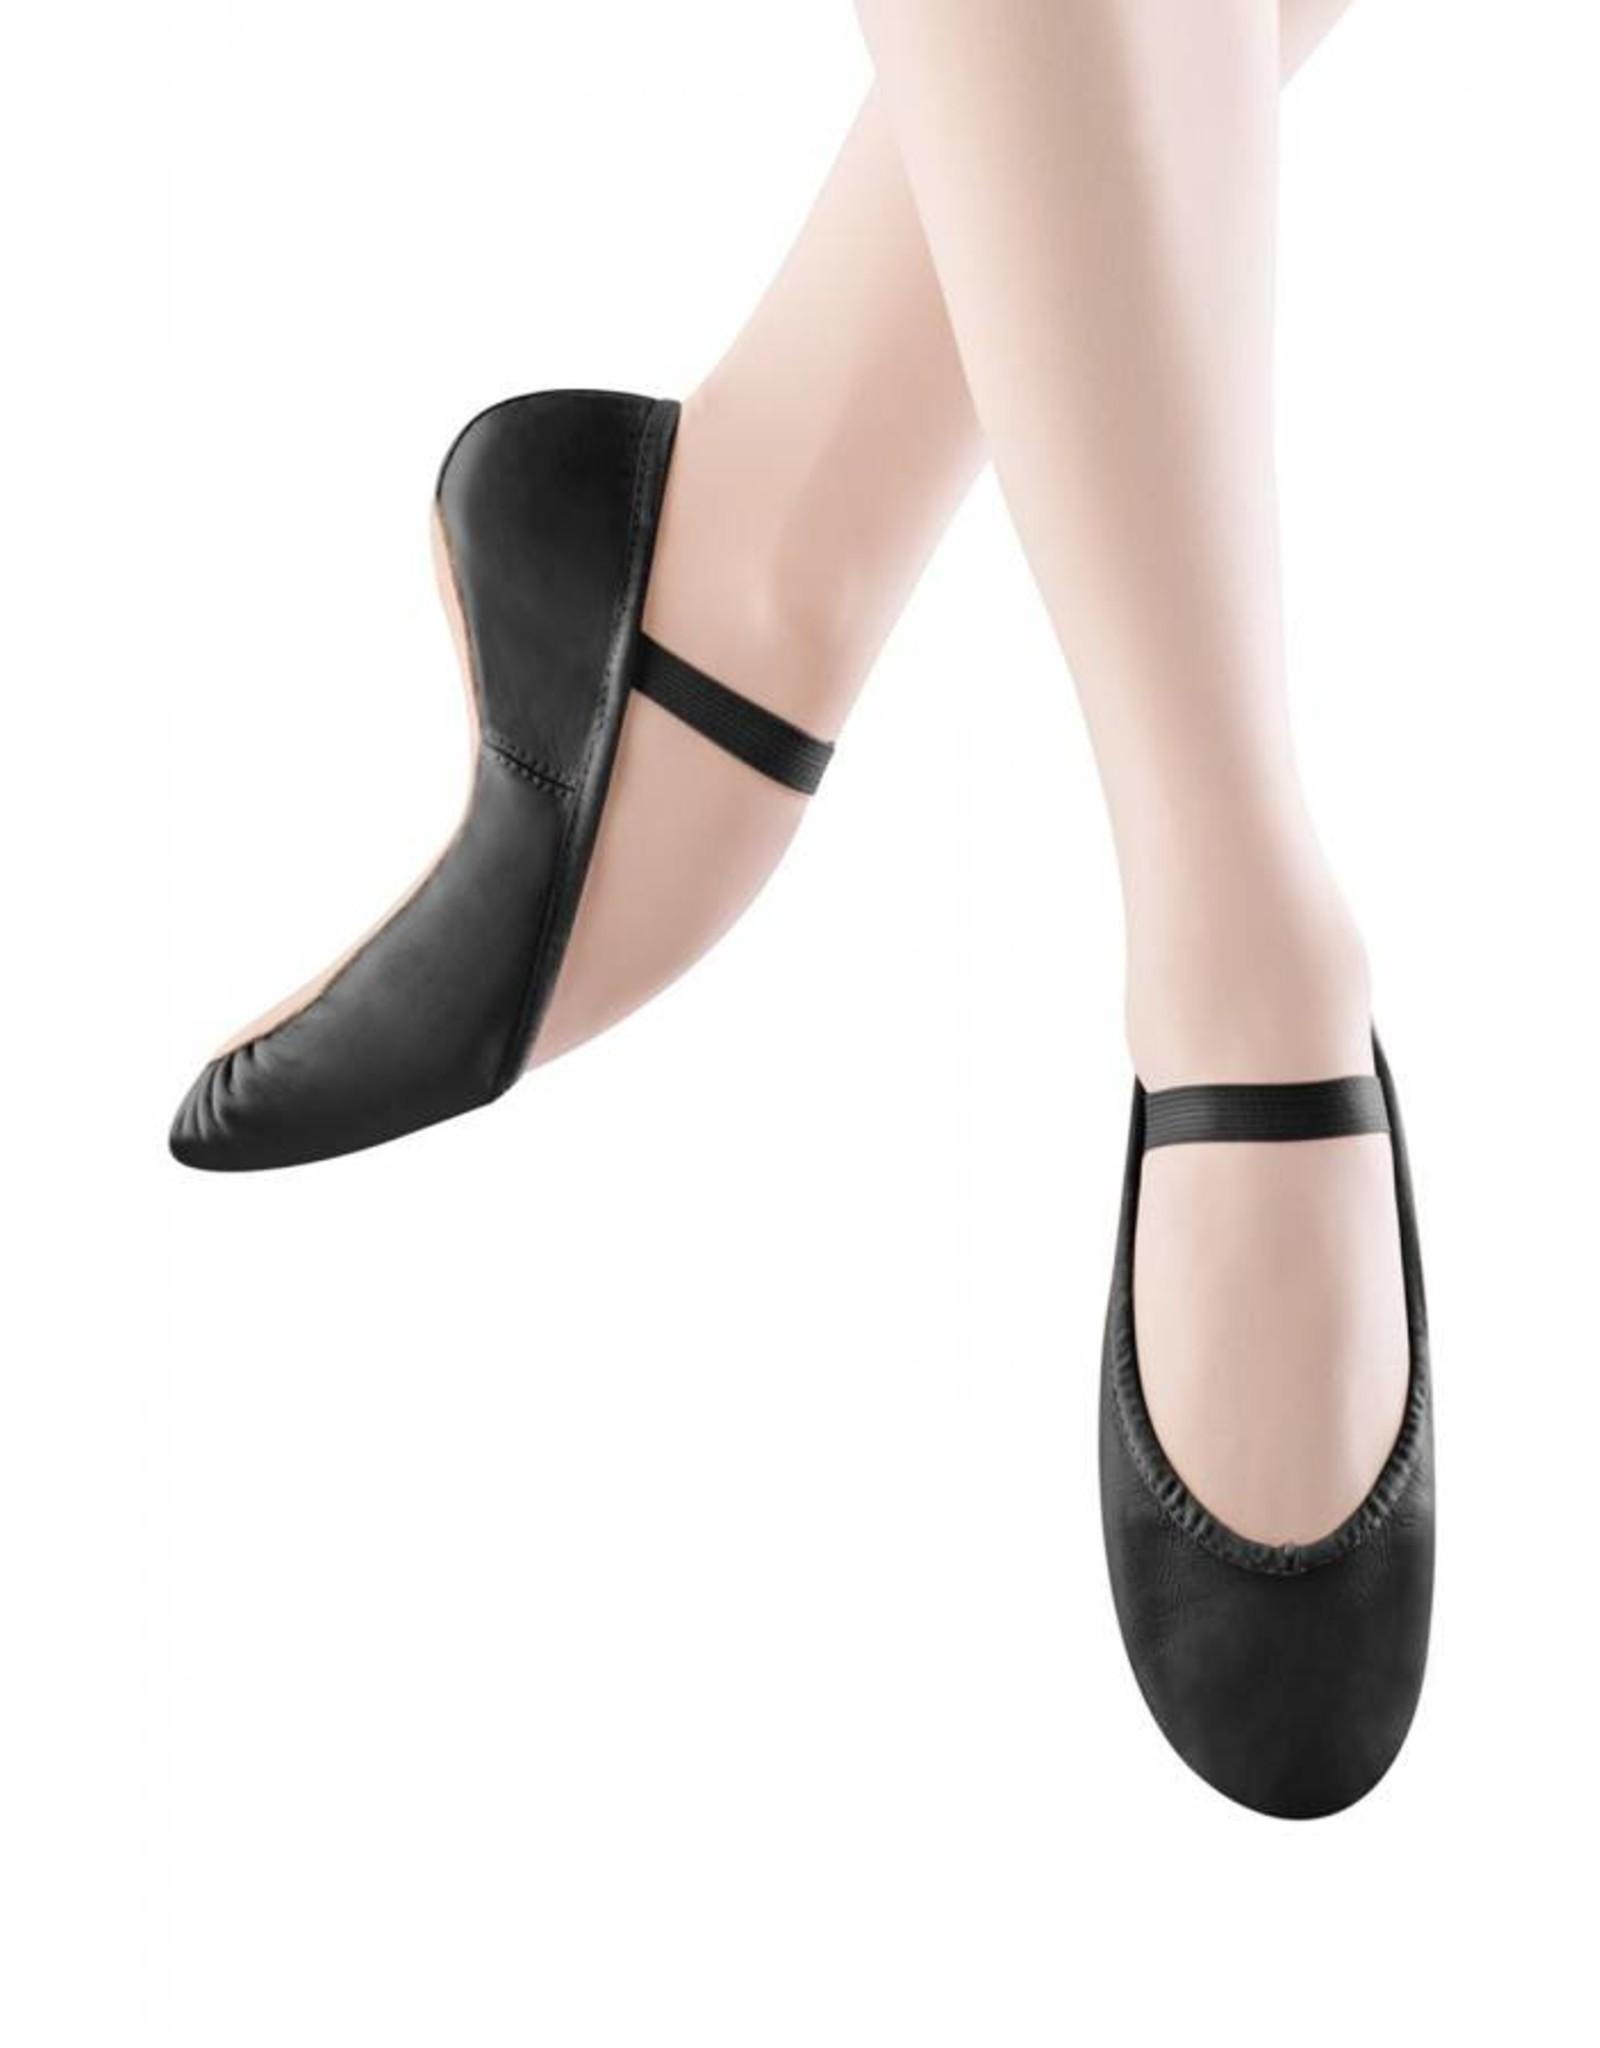 Bloch S0205 G Full sole Leather Ballet Shoe BLACK